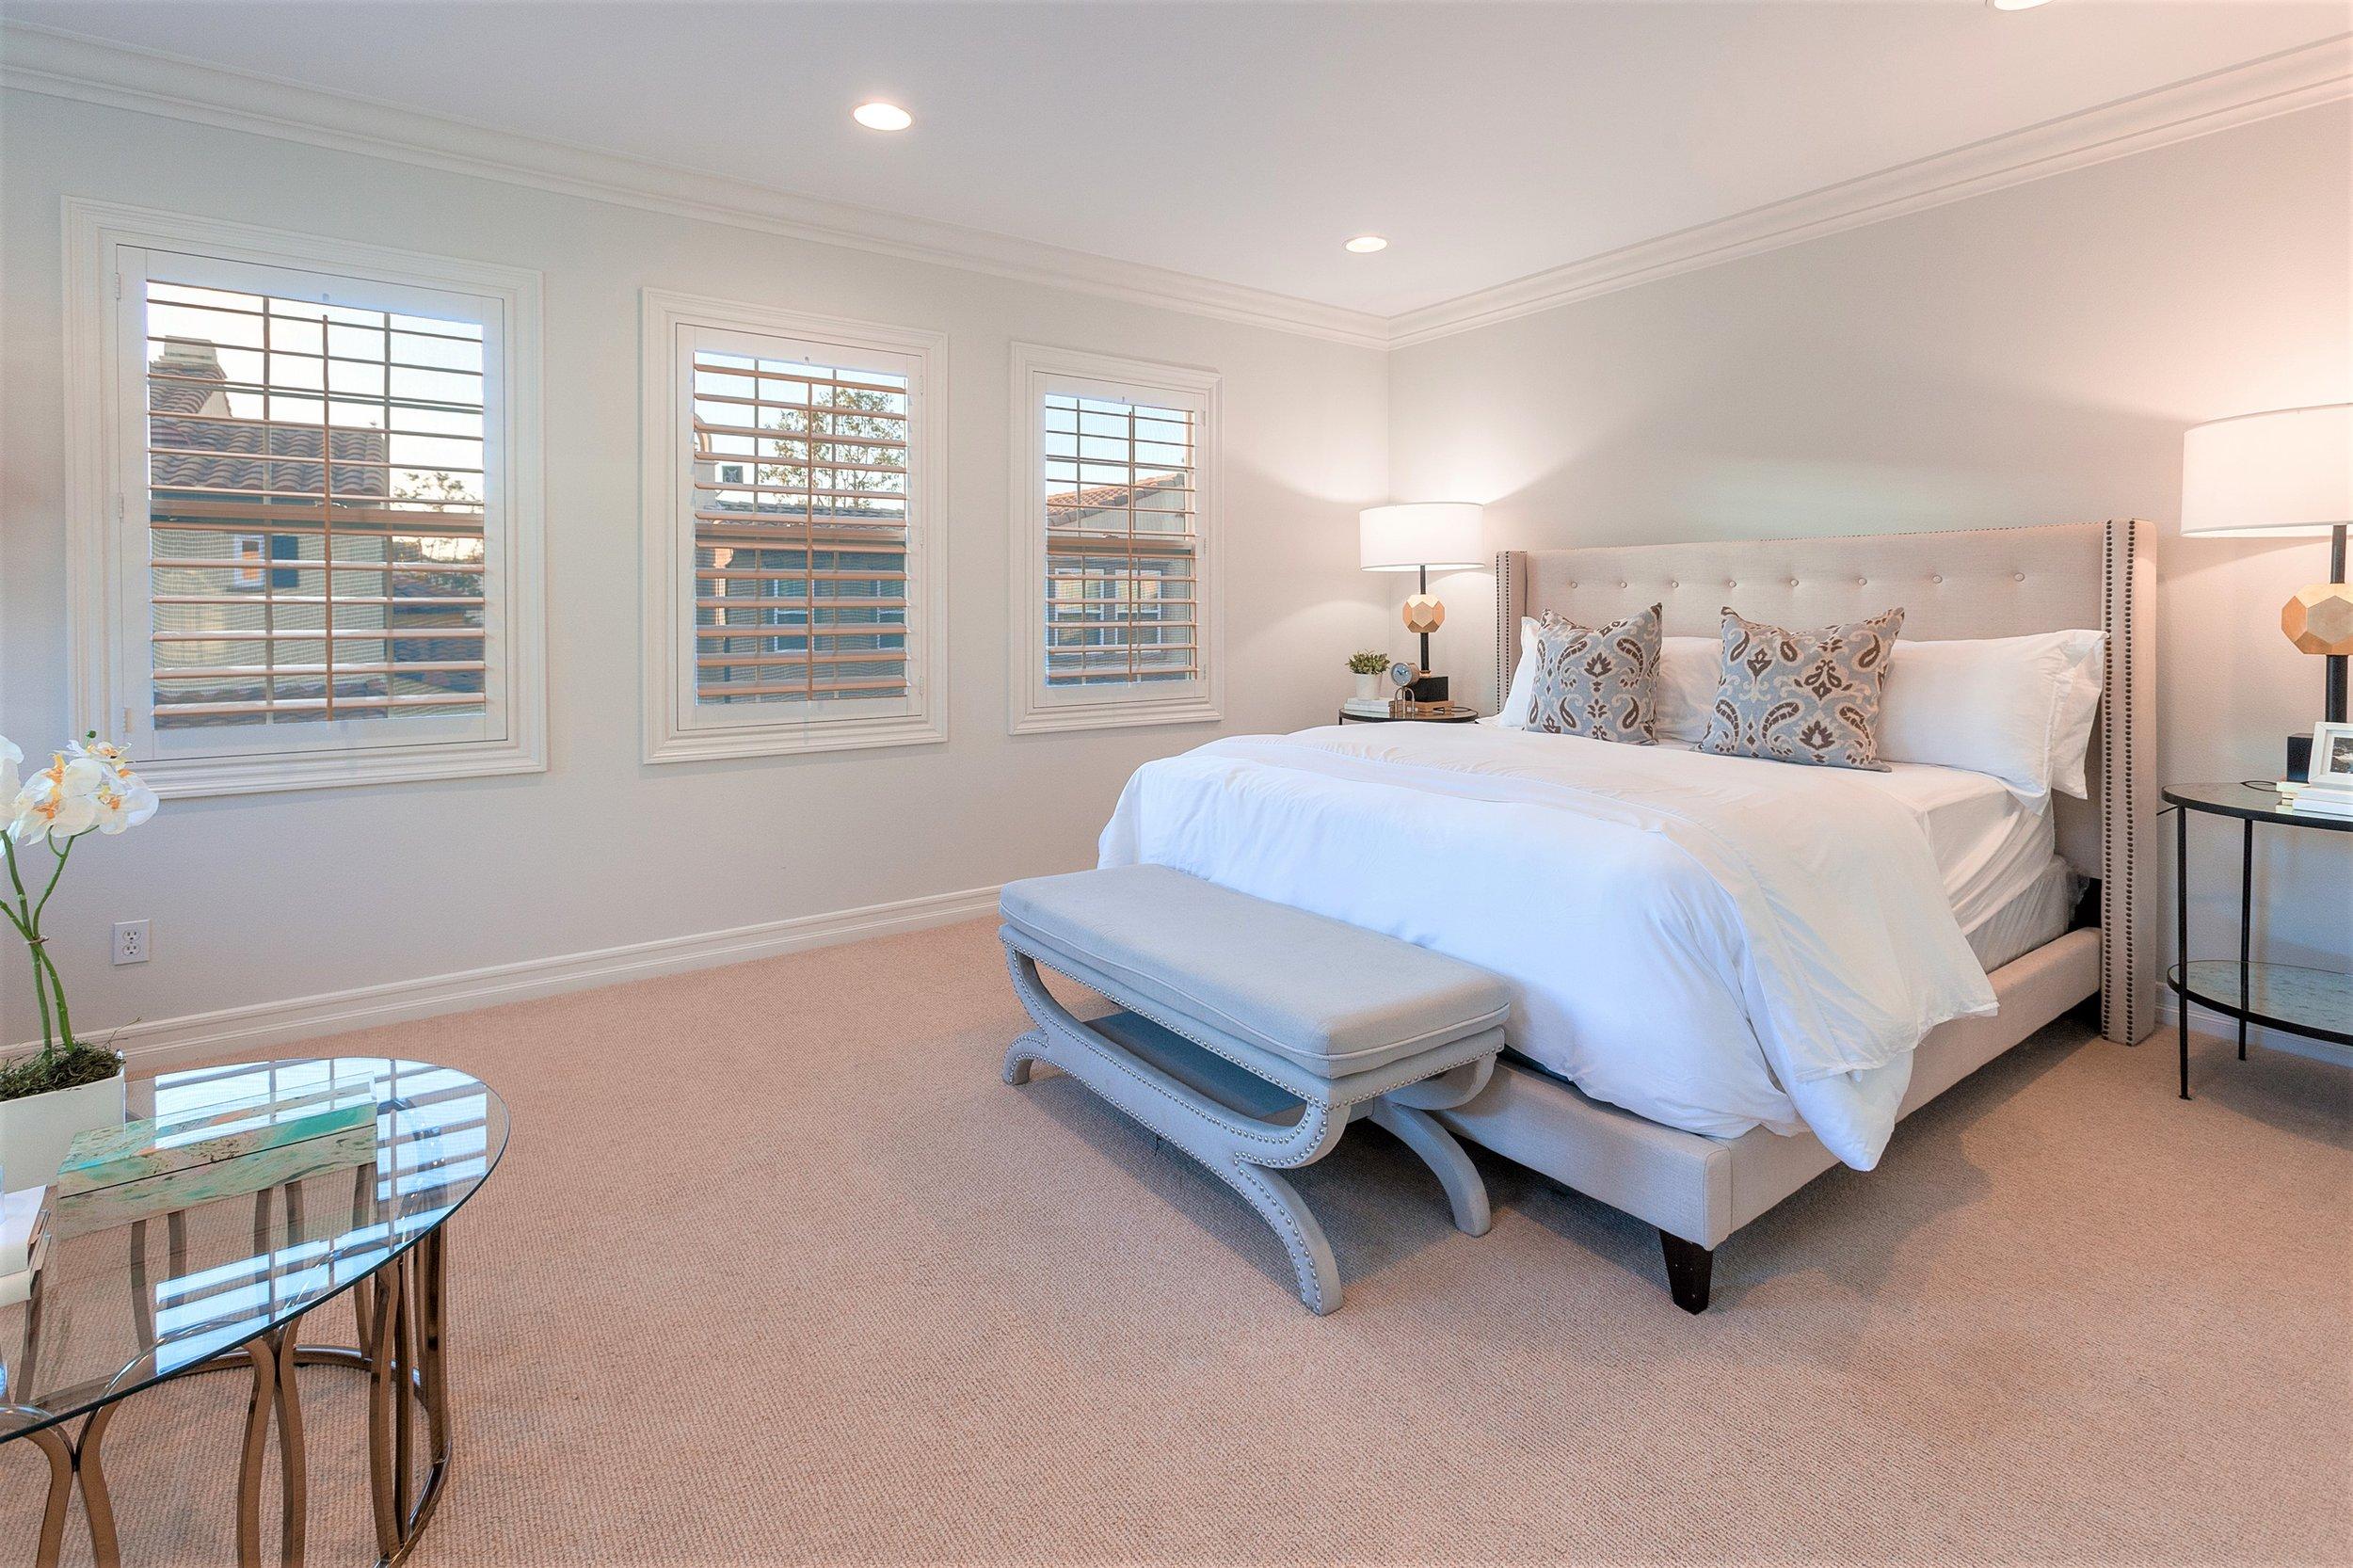 207 Tuberose - Master Bedroom.jpg